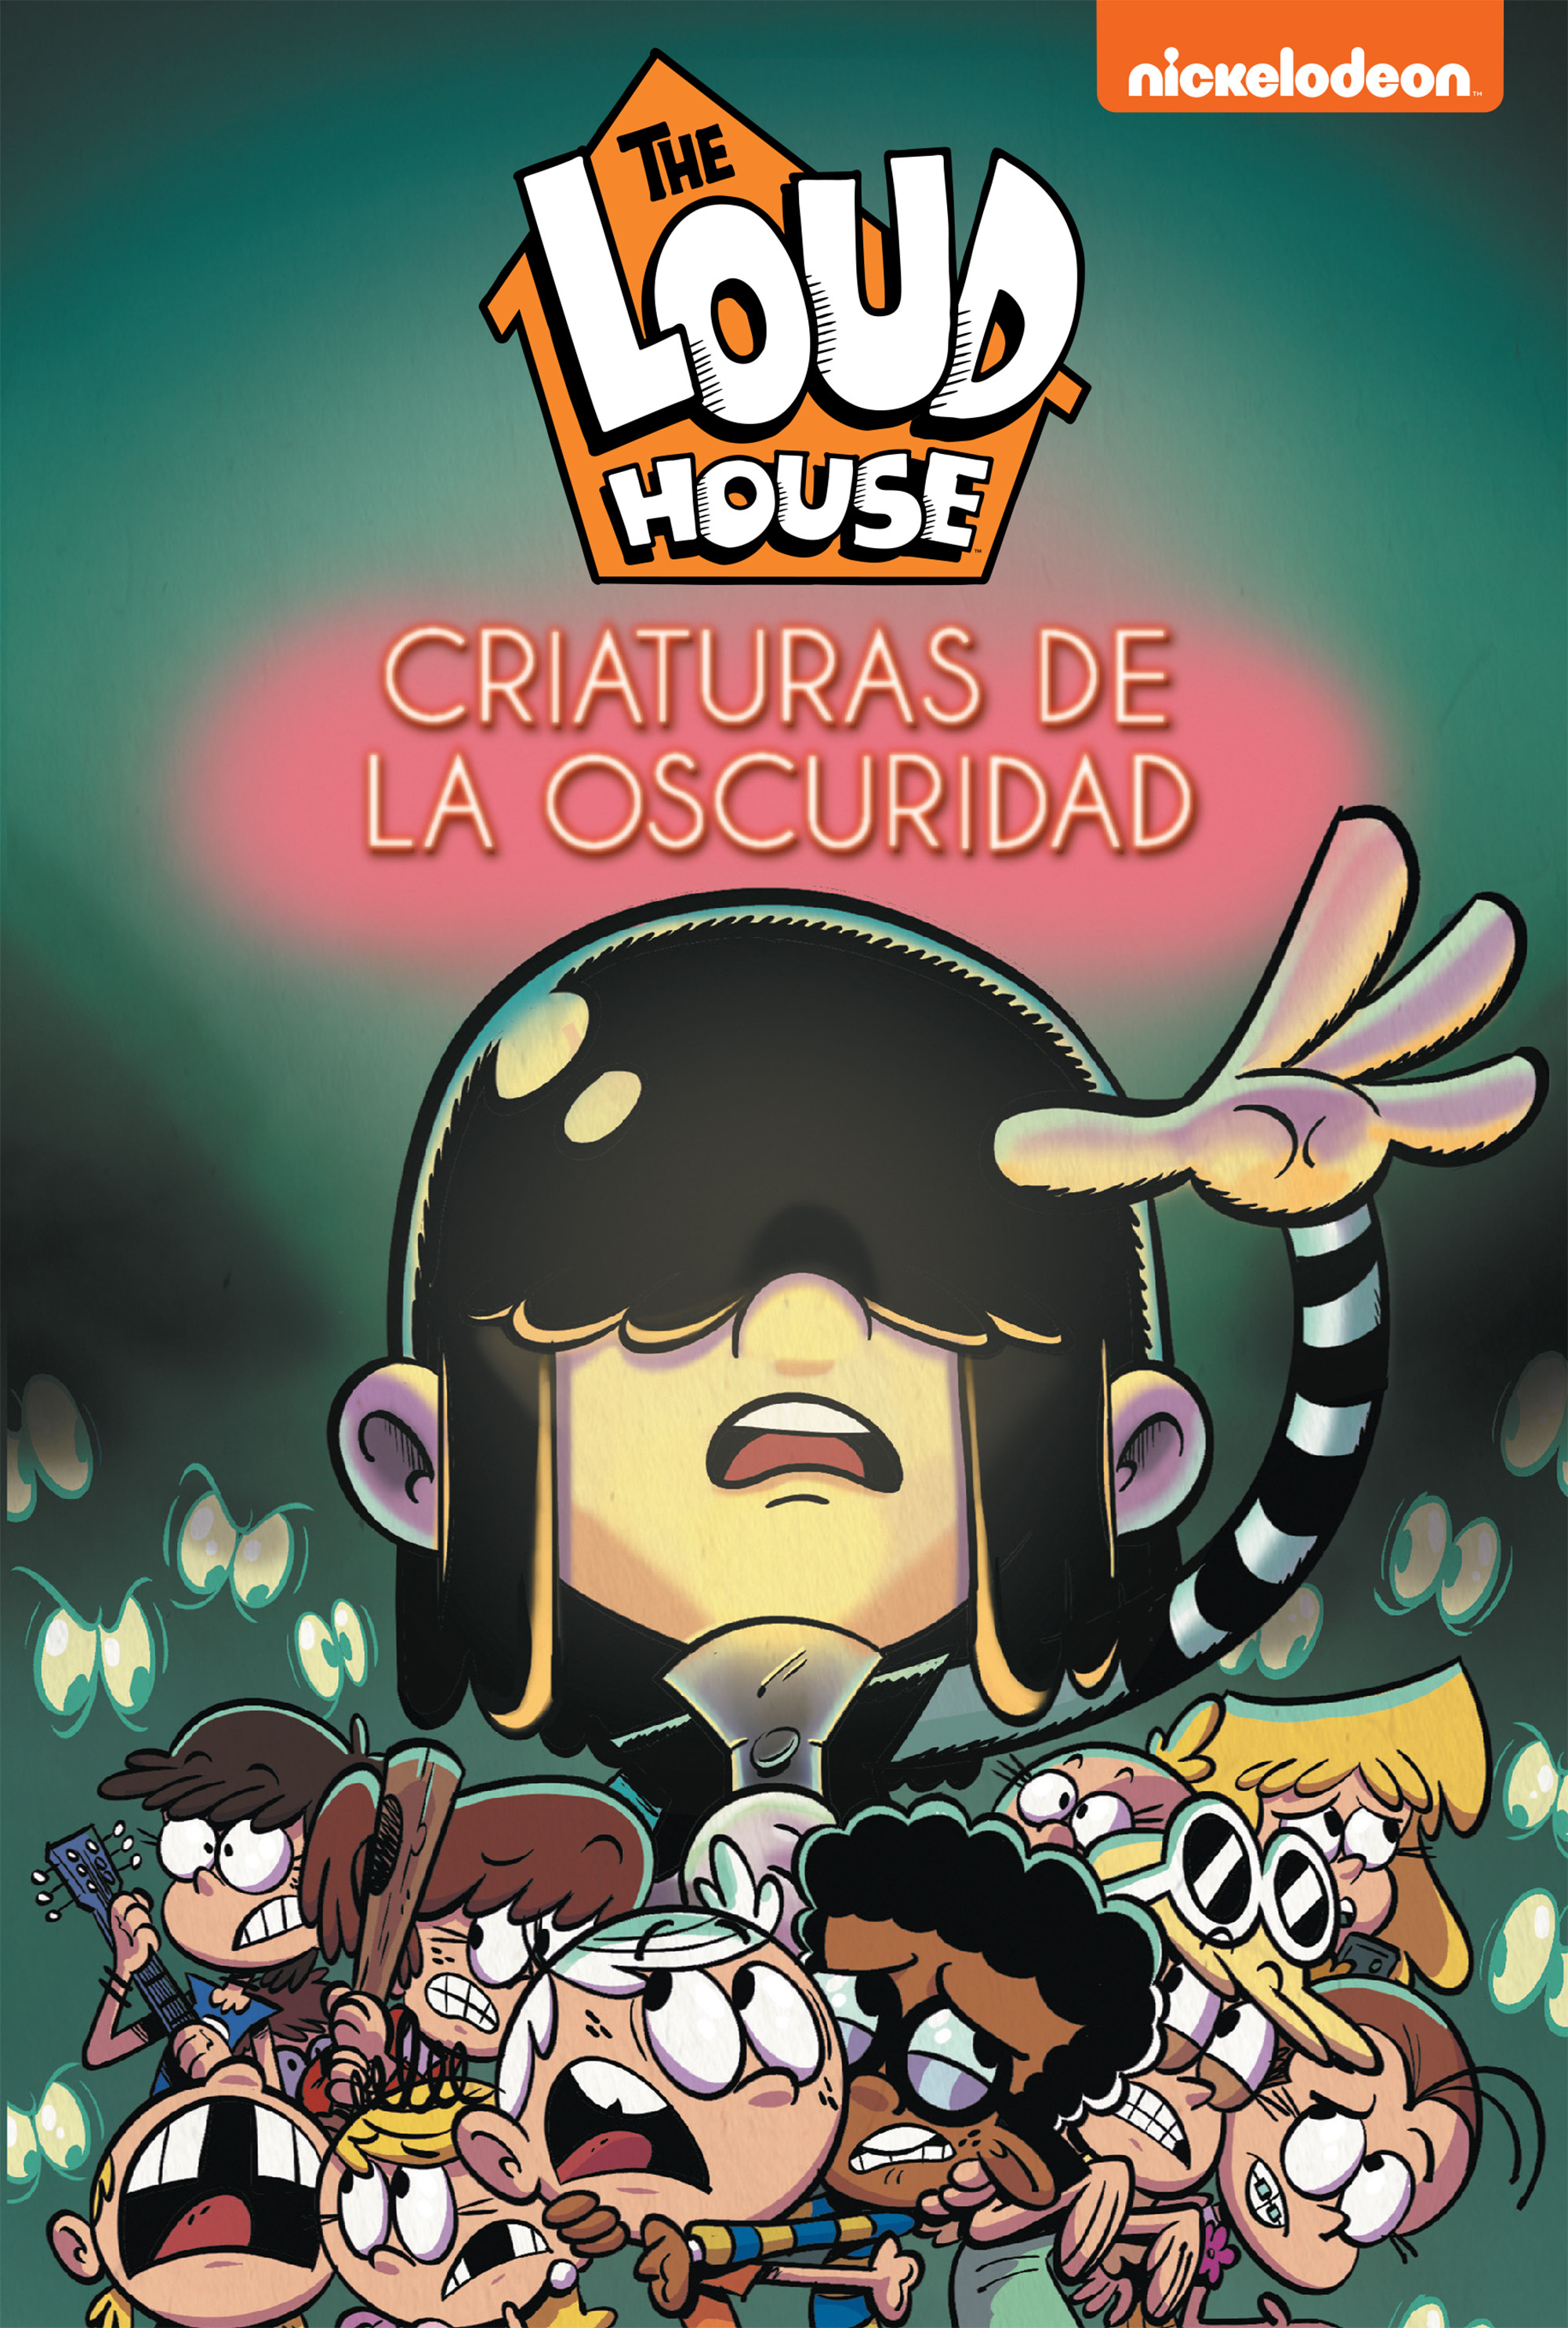 Criaturas de la oscuridad (The Loud House 7)